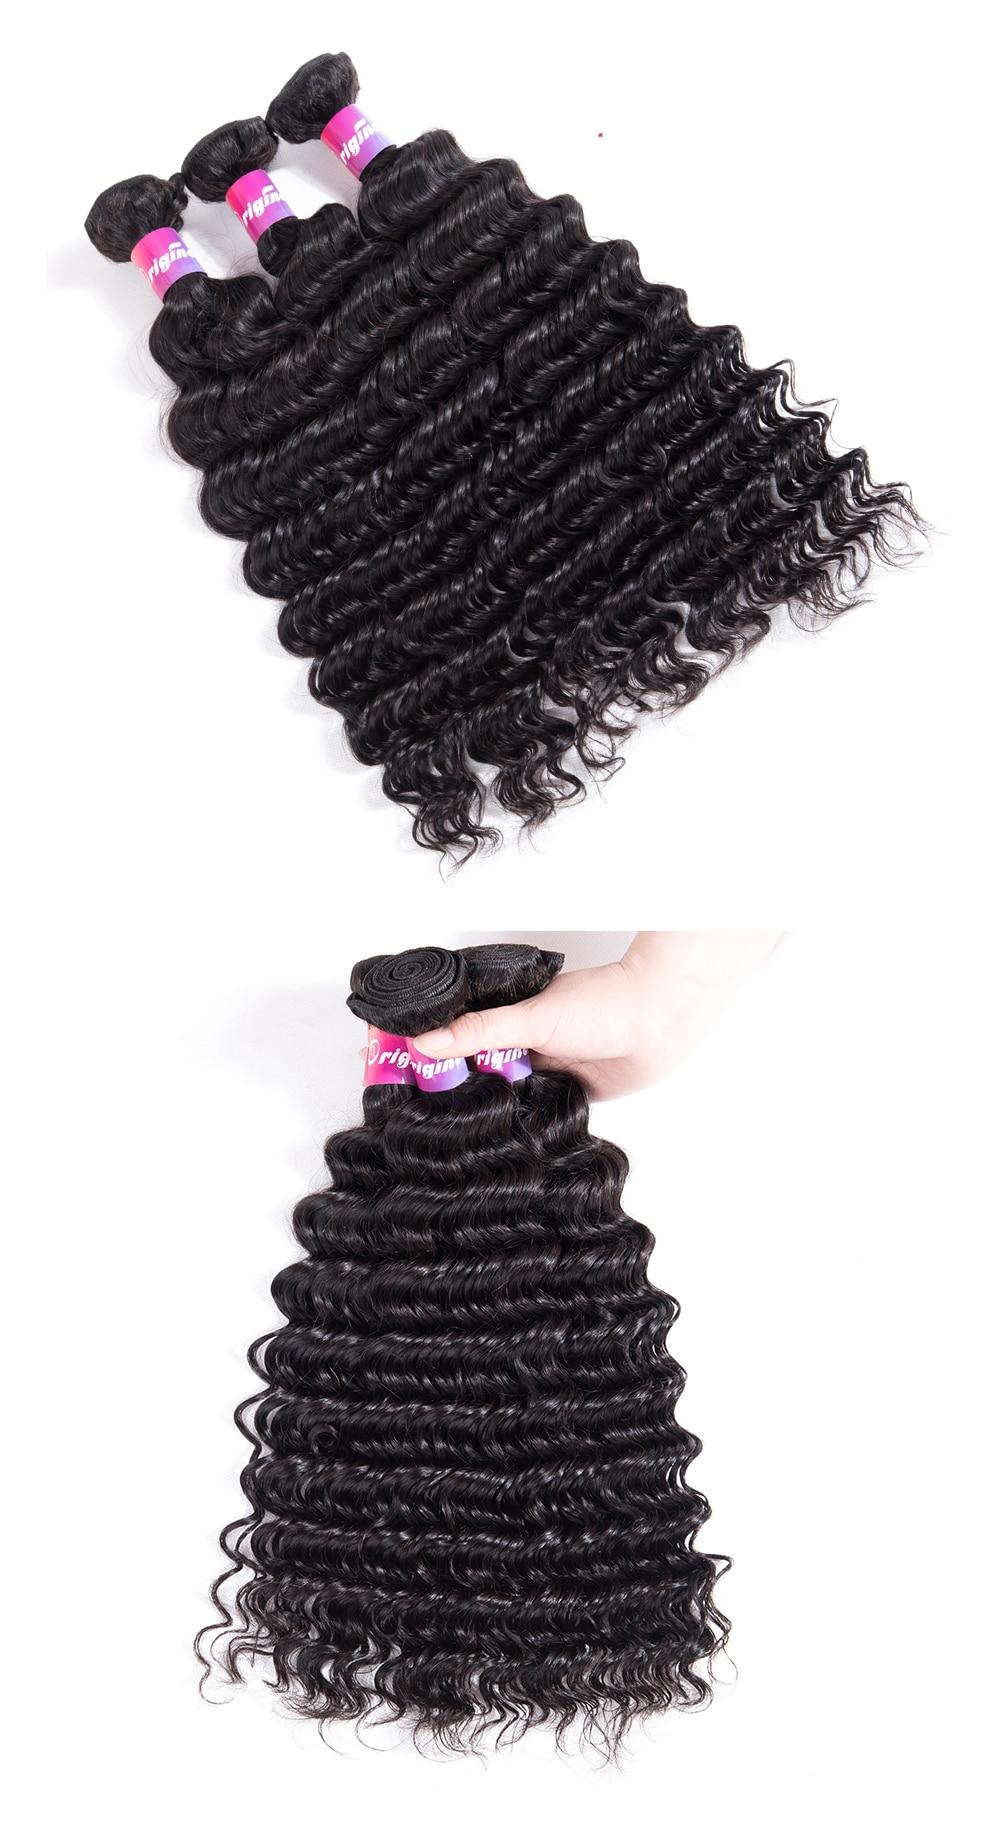 Deep wave human hair deep weave hair hair weave bundles deep wave human hair suppliers Brazilian Deep Wave 3pcs With 13x4Frontal Closure Human Hair Bundles With Frontal Originea Hair Weave